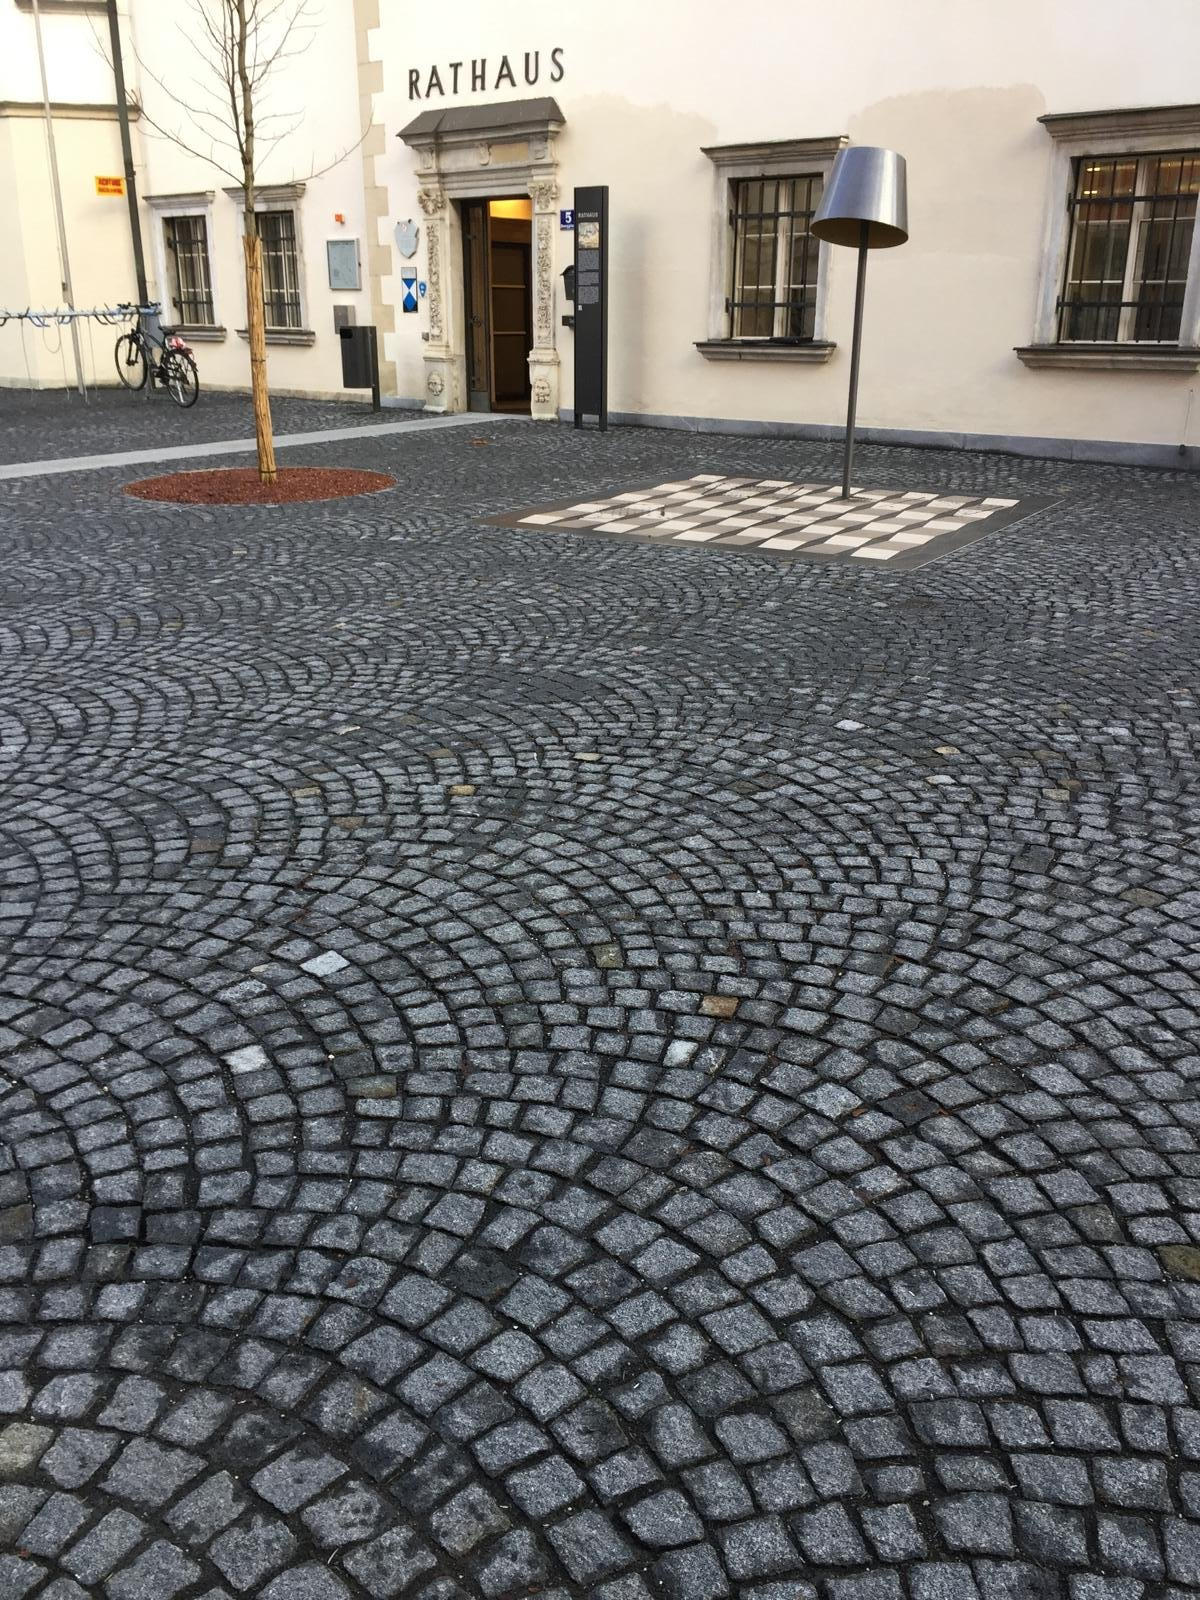 Spittal An Der Drau - Rathausmarkt10